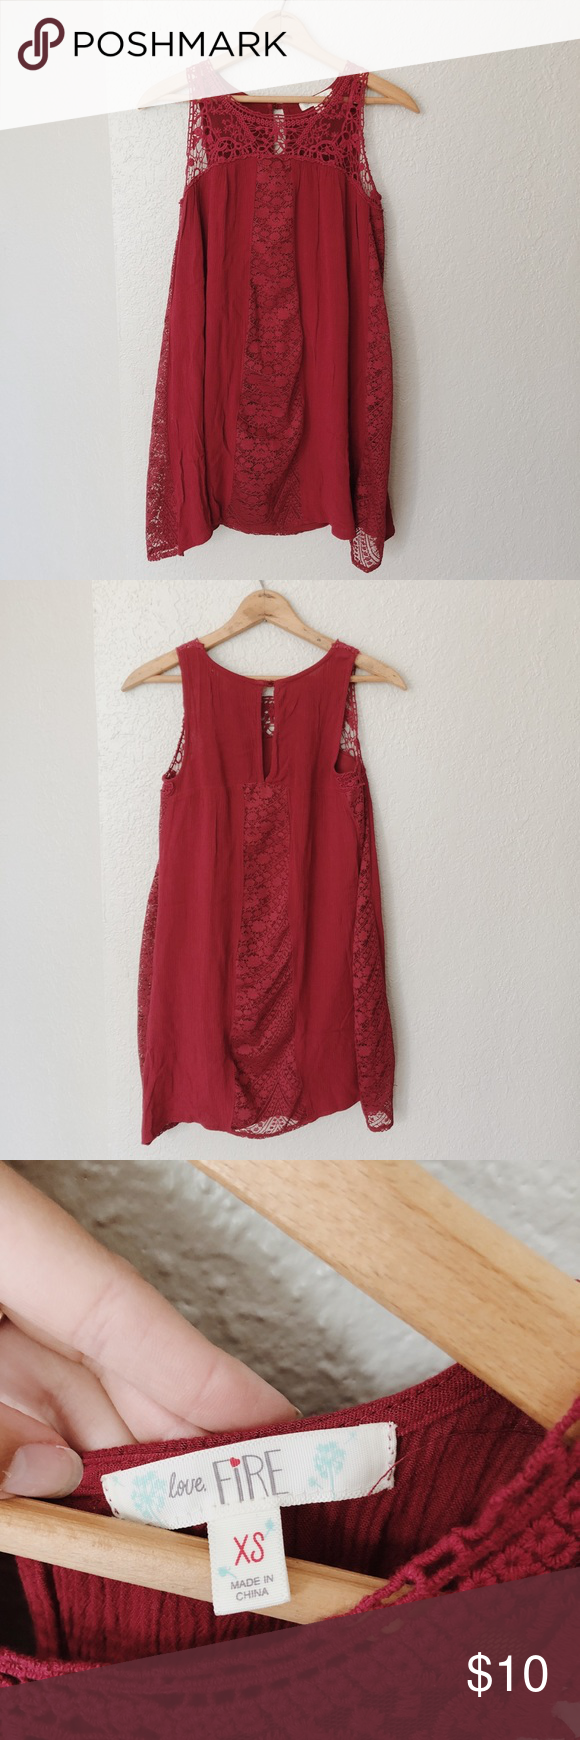 Dark red lace mini dress dark red lace mini dress size xs love fire